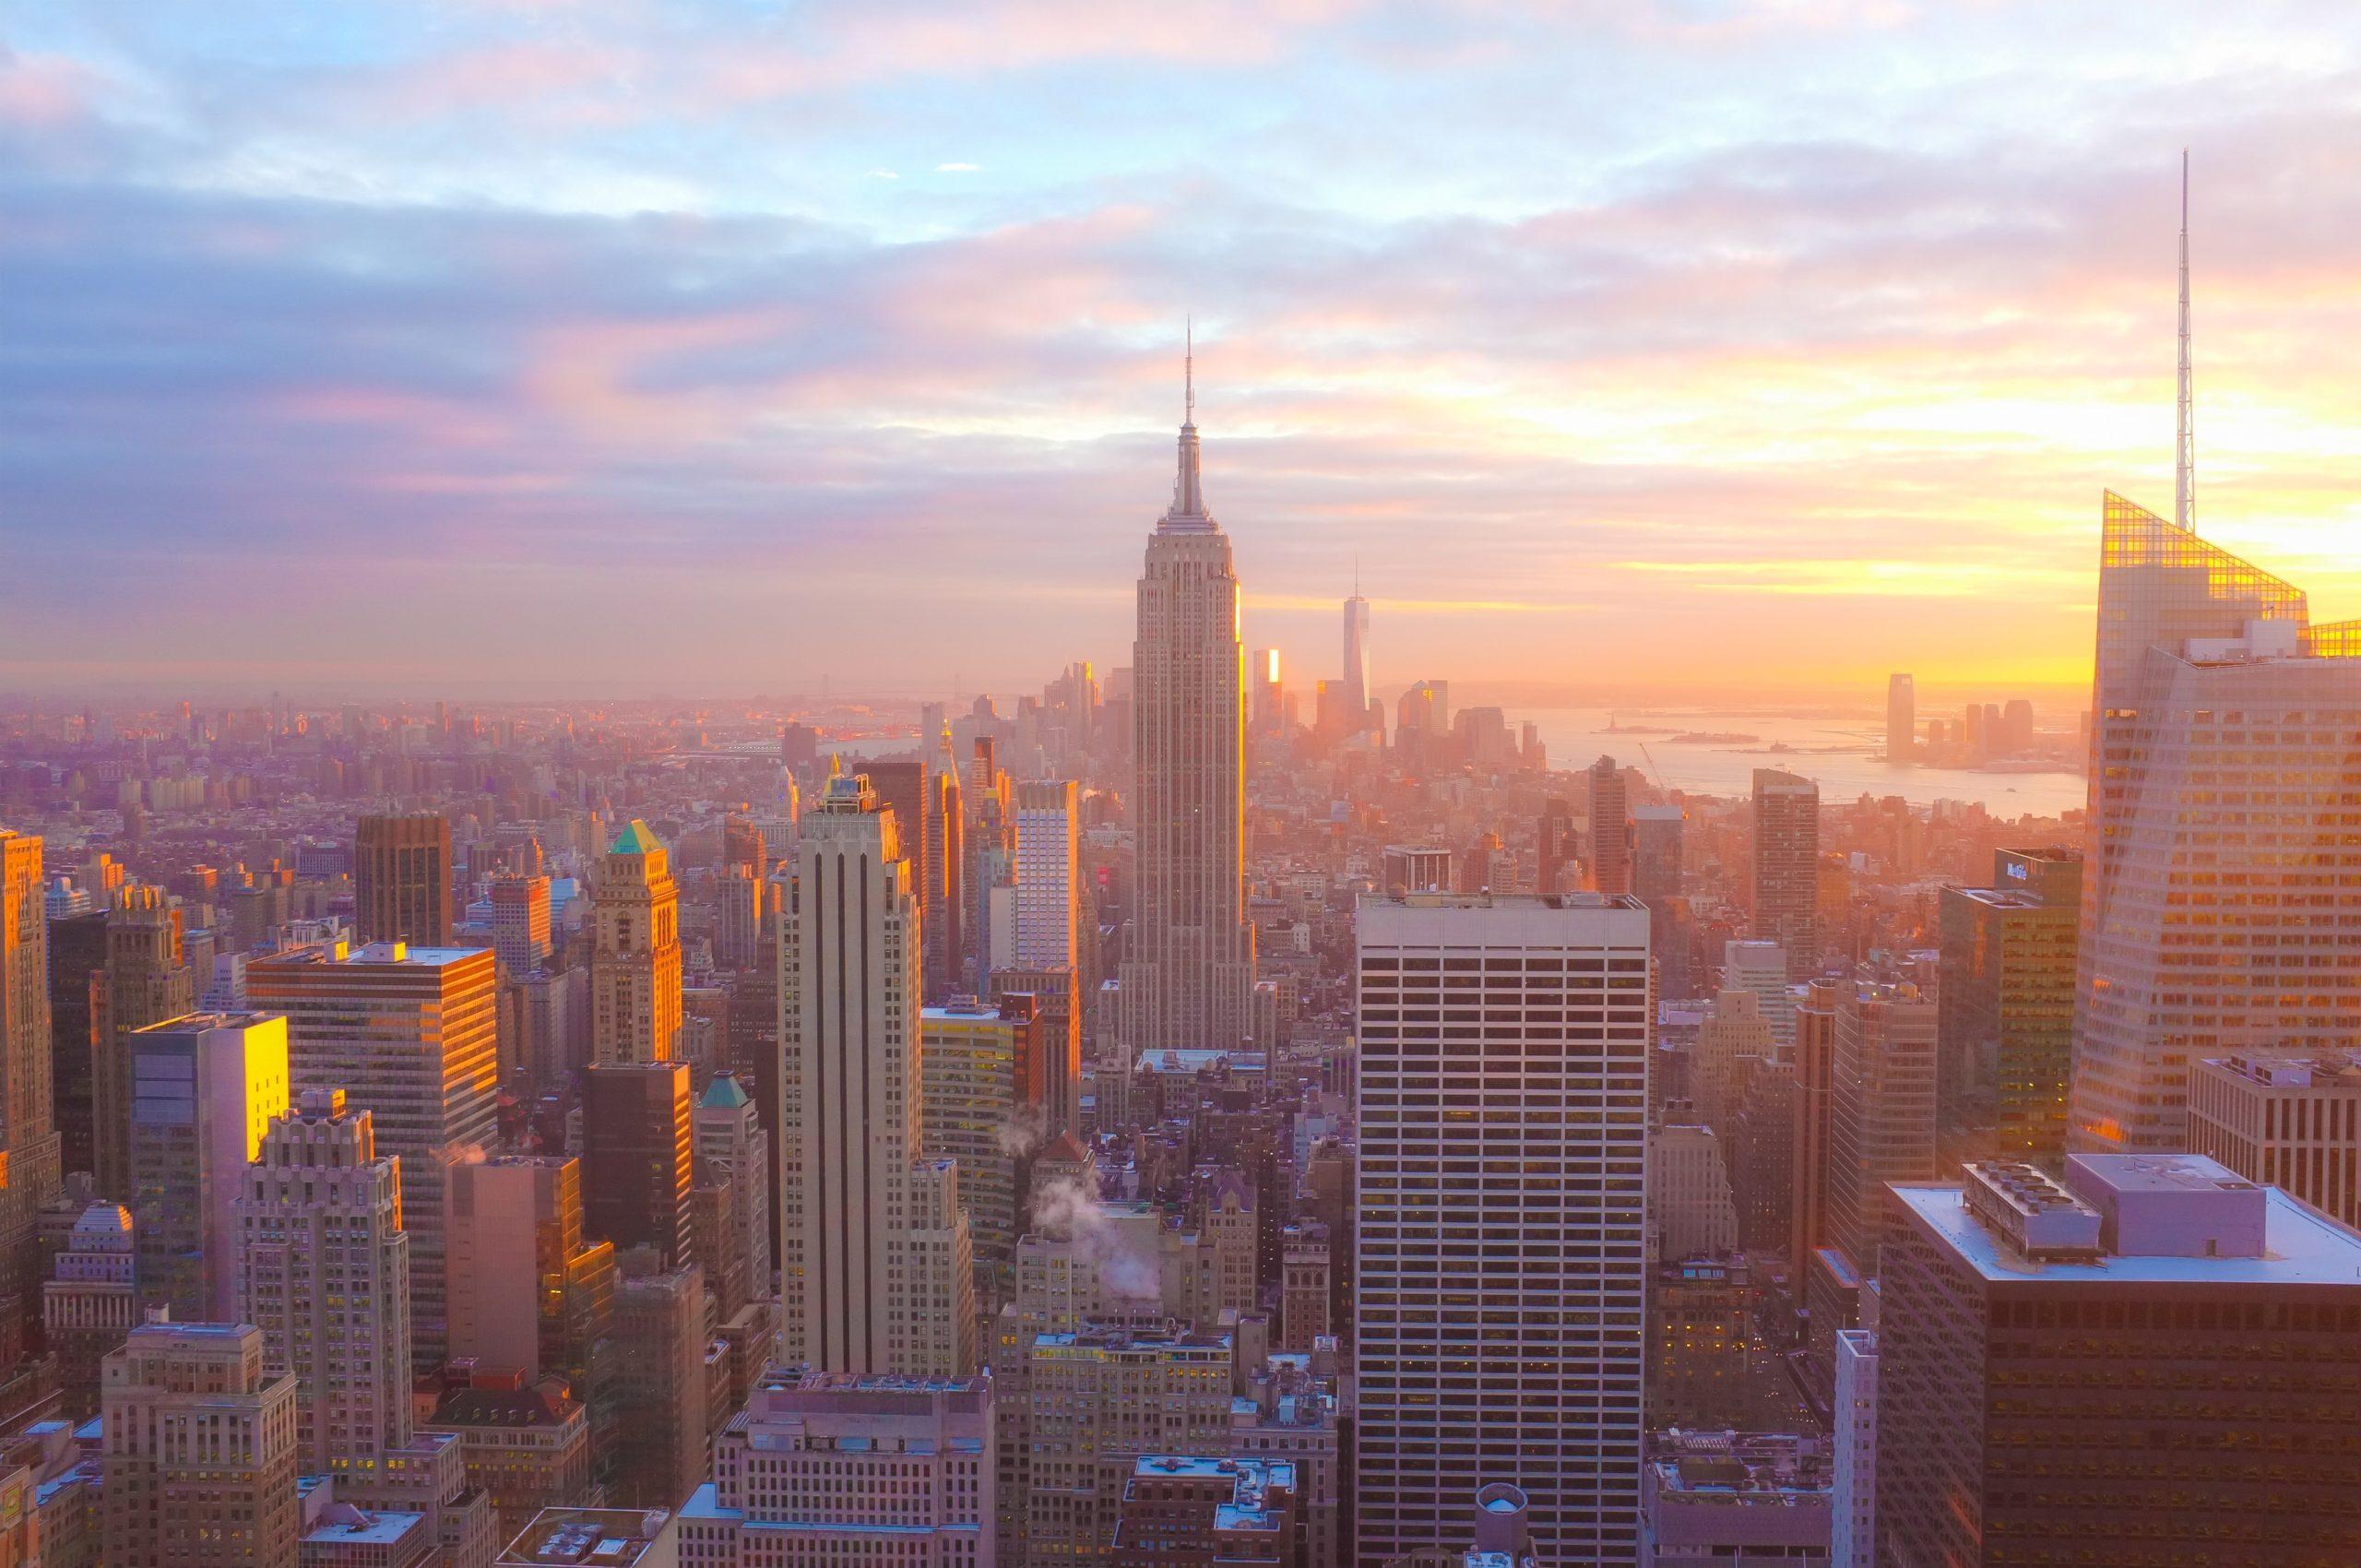 NYC Medical Cannabis Program to Get First Cannabis Gummy